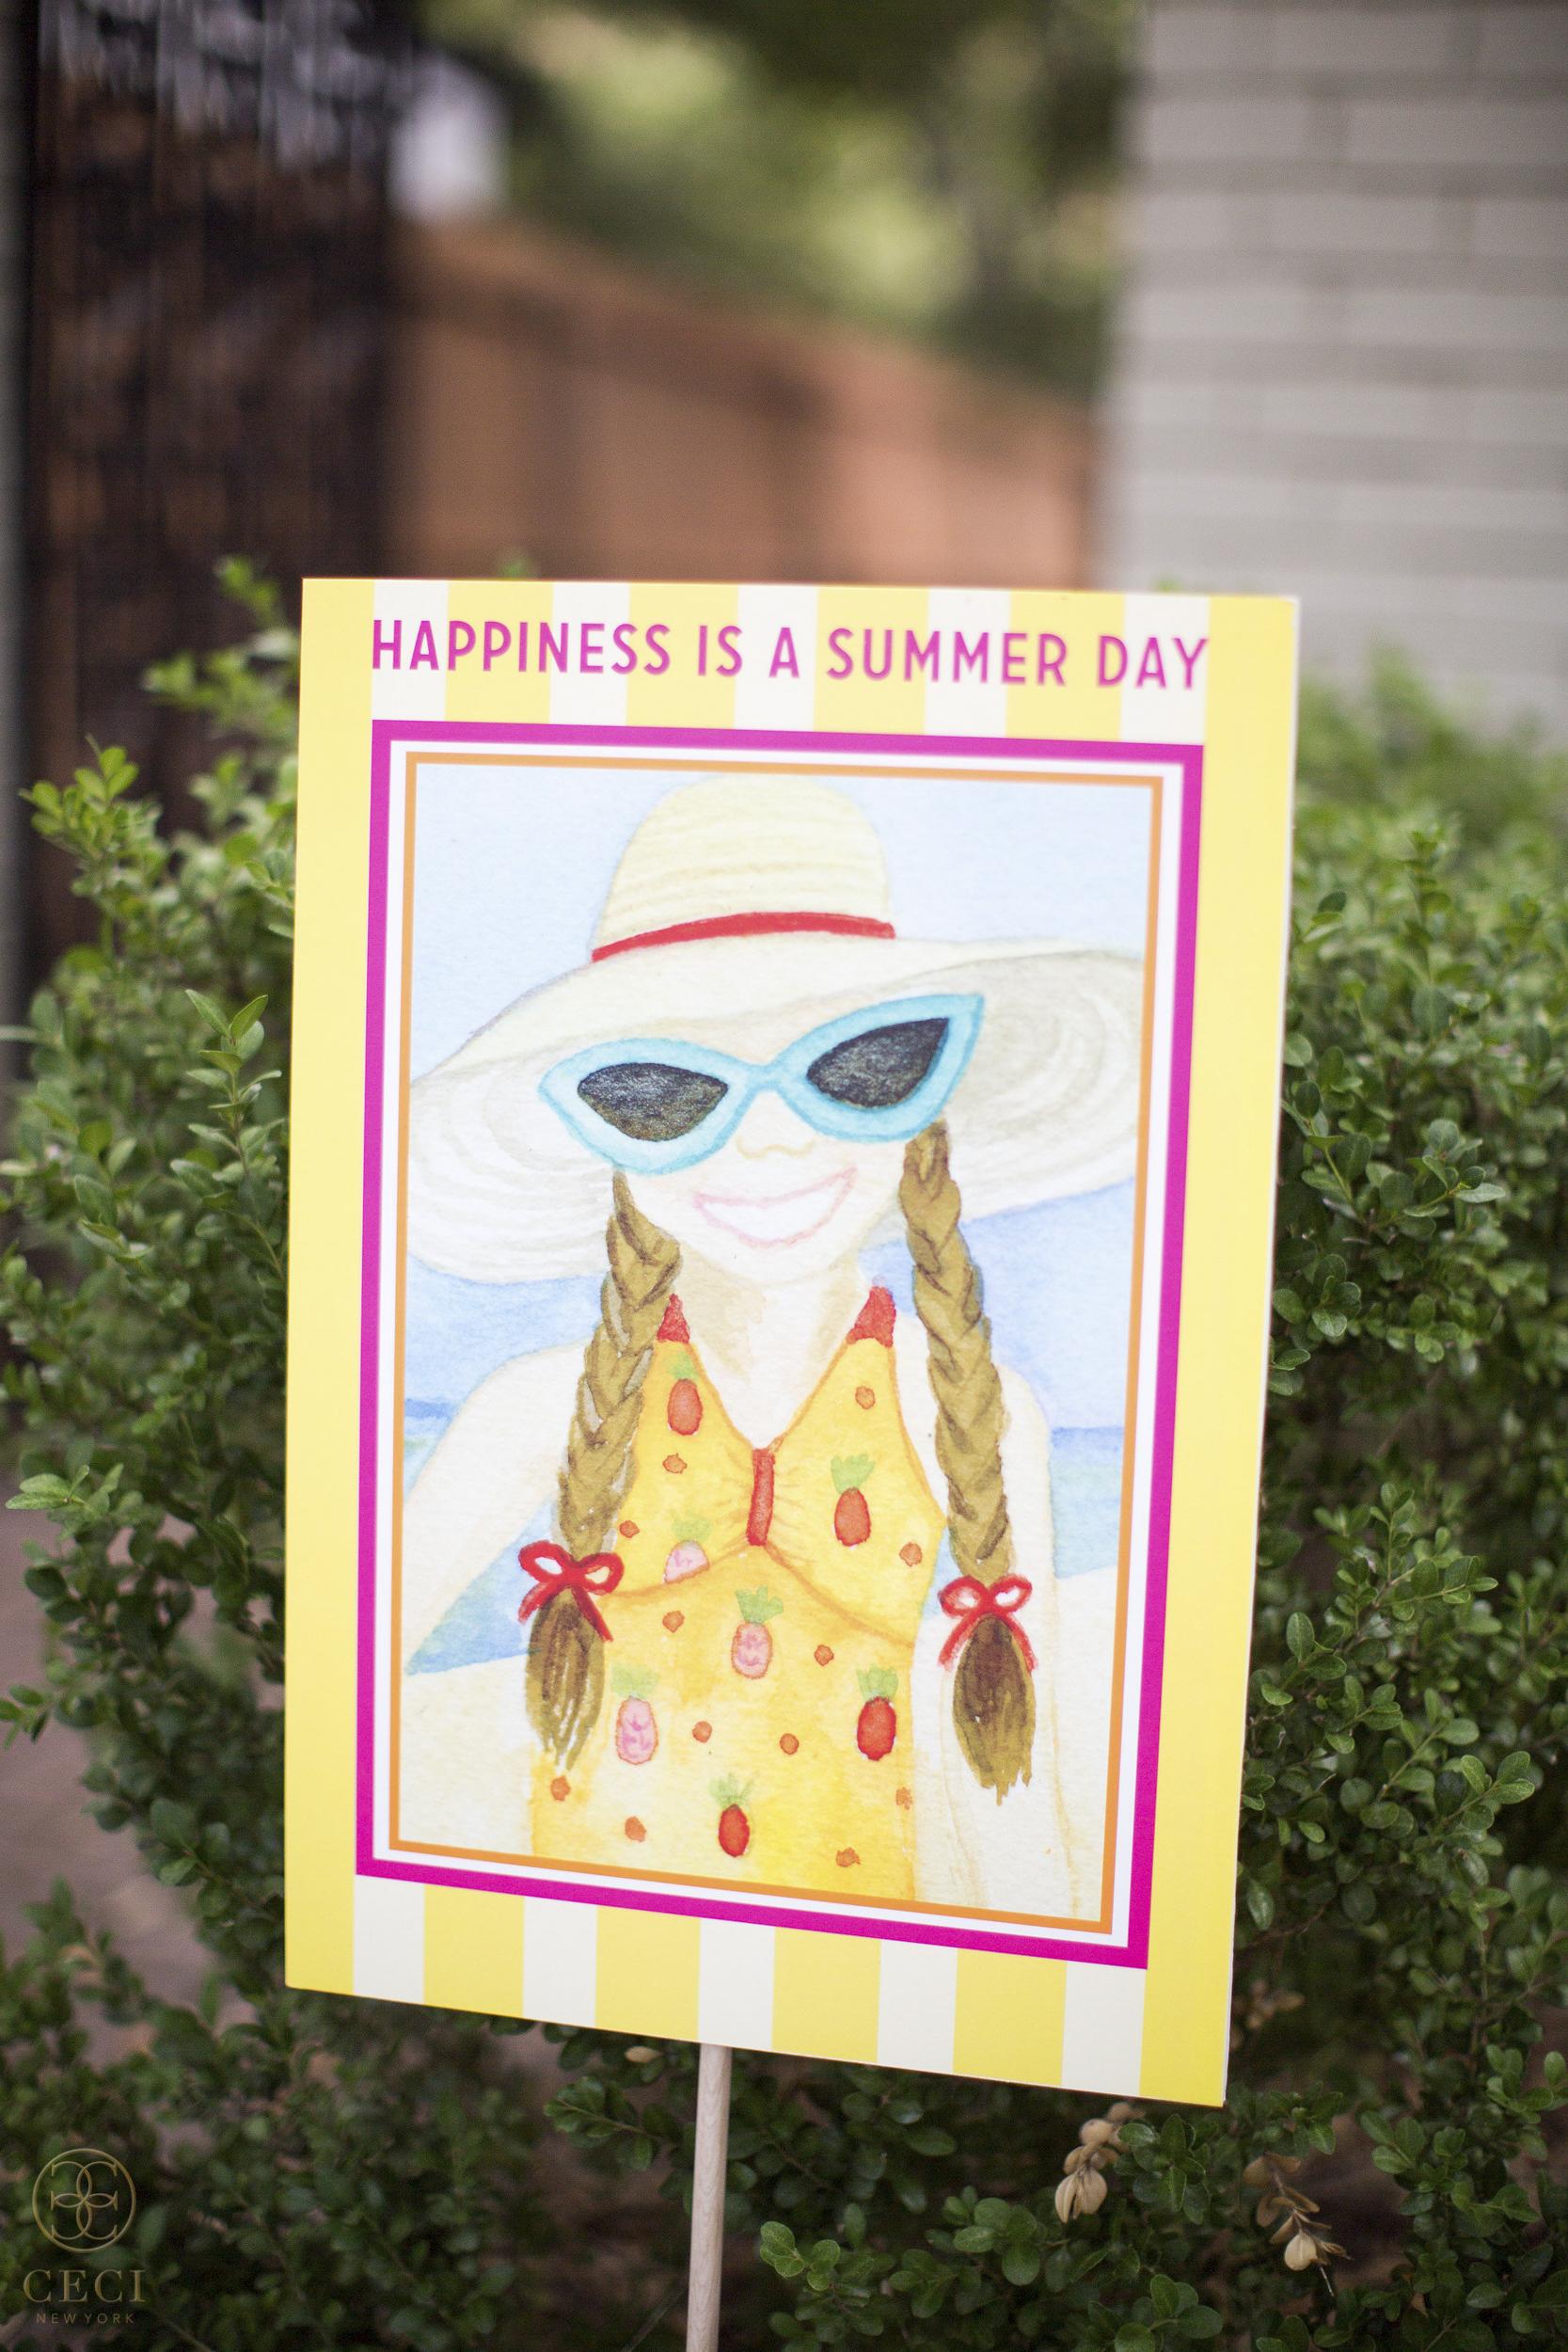 dallas_texas_birthday_party_mae_emily_clarke_events_kids_retro_pool_swim_endless_summer_invitations_ceci_new_york_invitations_watercolor_illustration_decor-2.jpg